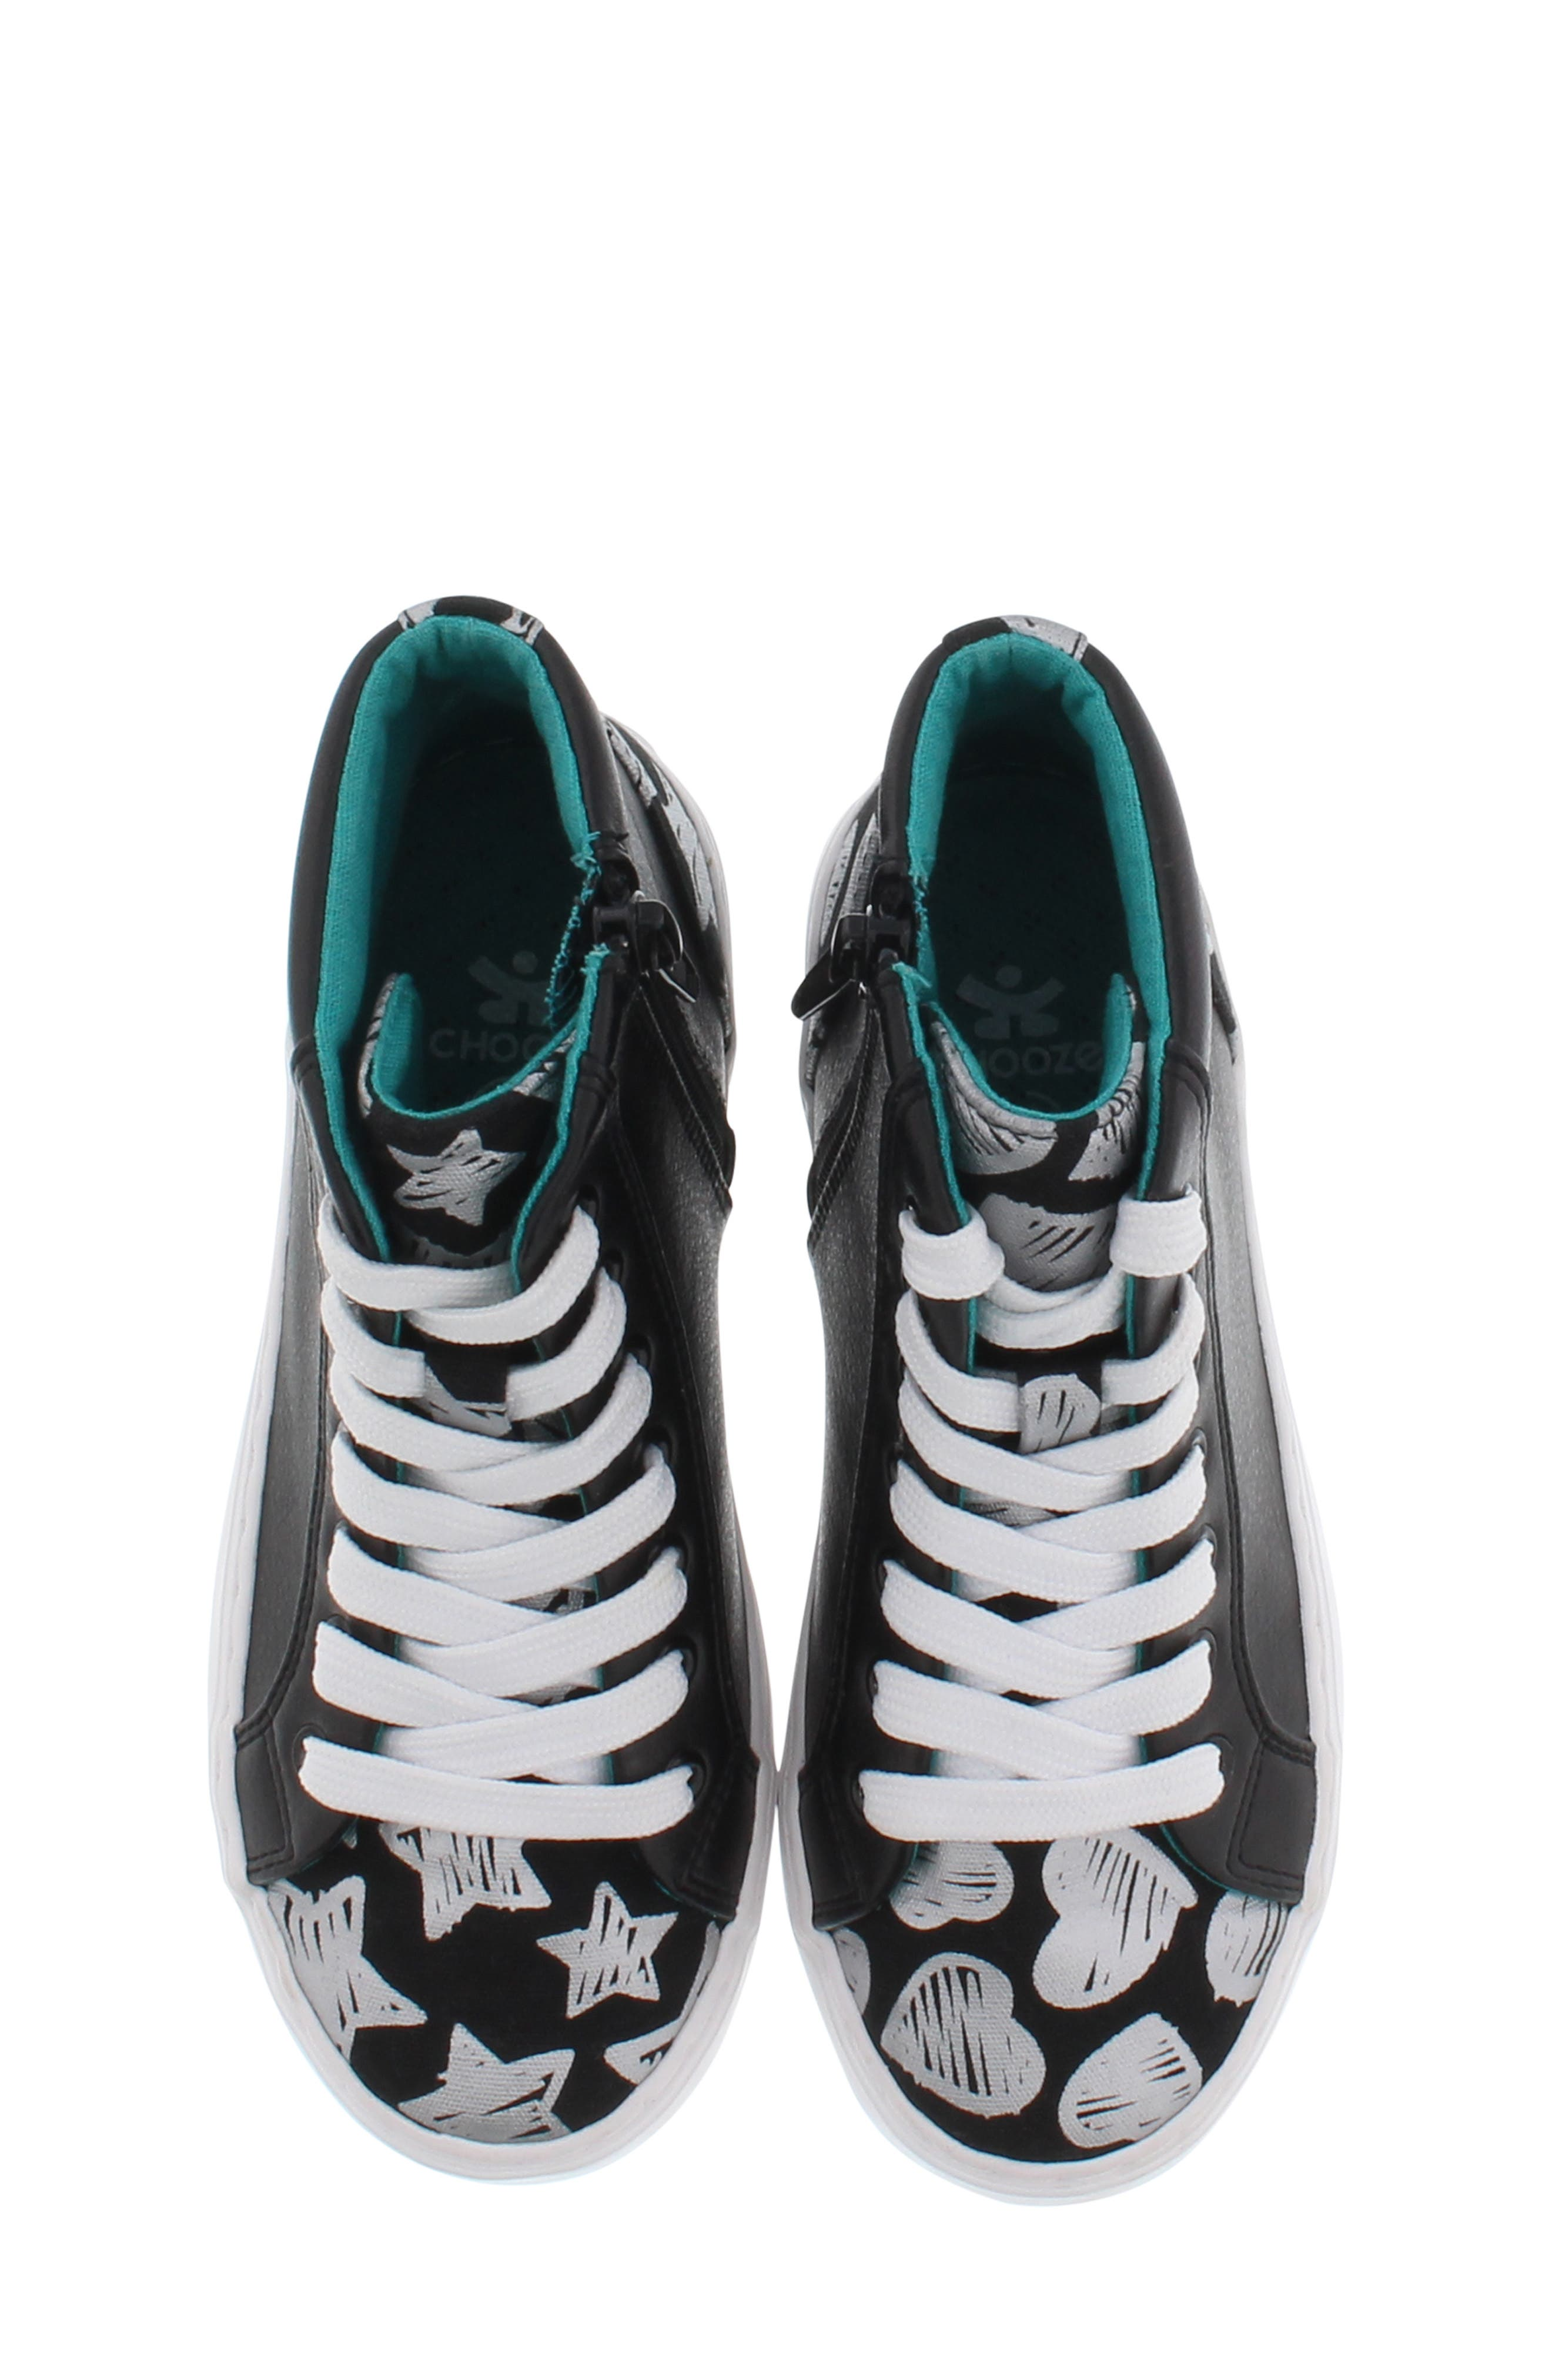 CHOOZE, Uplift Superstar High Top Sneaker, Alternate thumbnail 5, color, BLACK